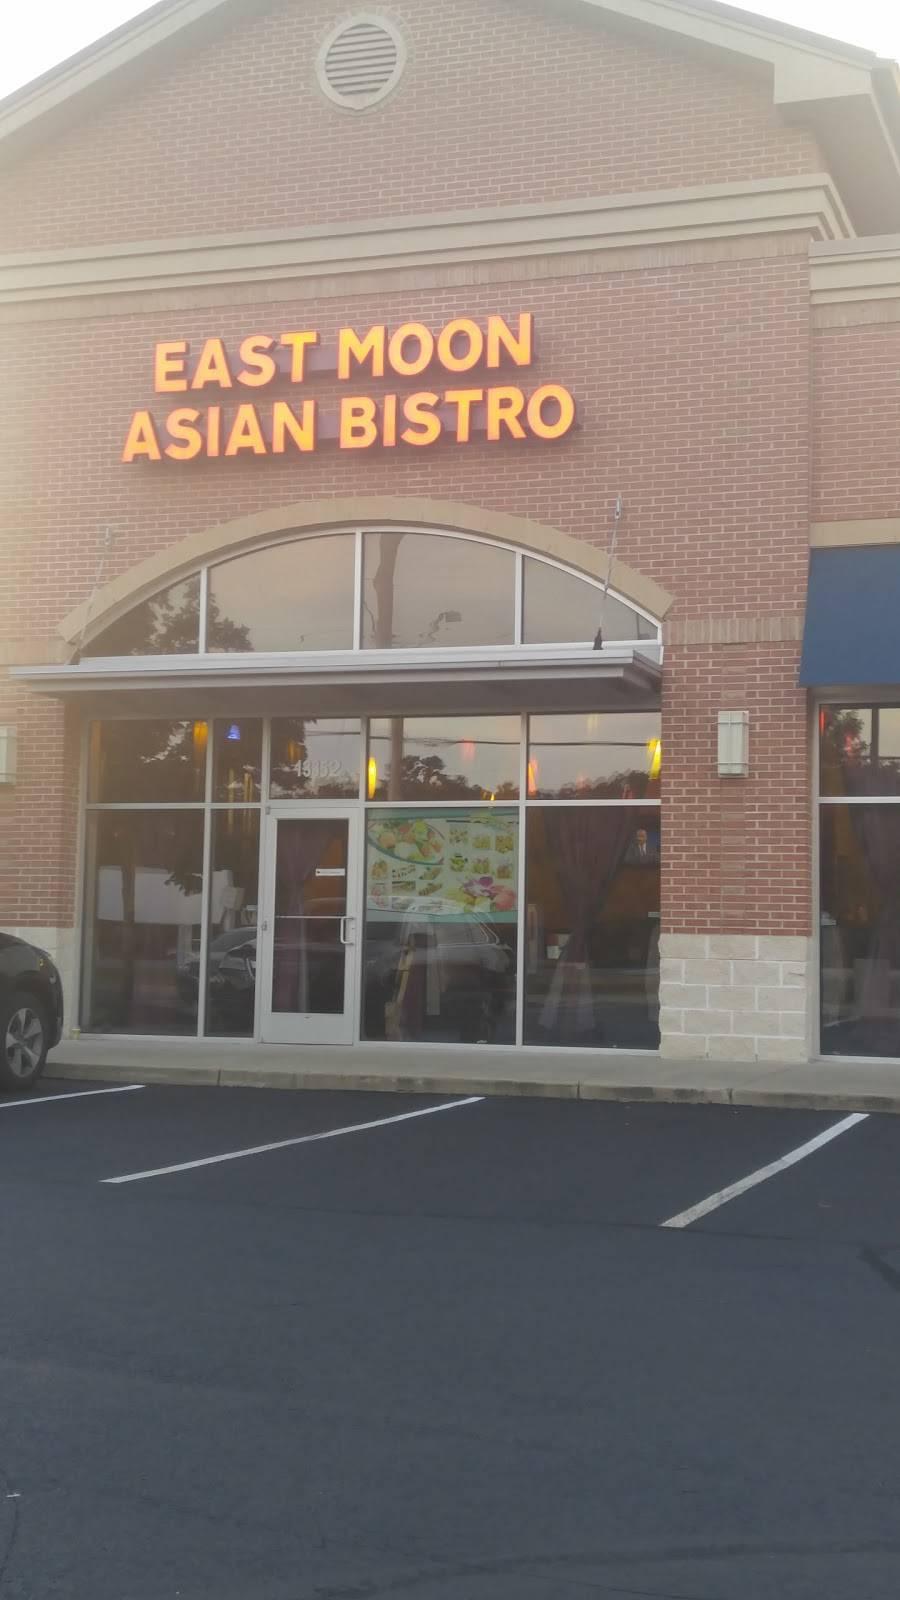 East Moon Bistro | restaurant | 13352 Minnieville Rd, Woodbridge, VA 22192, USA | 7038782688 OR +1 703-878-2688